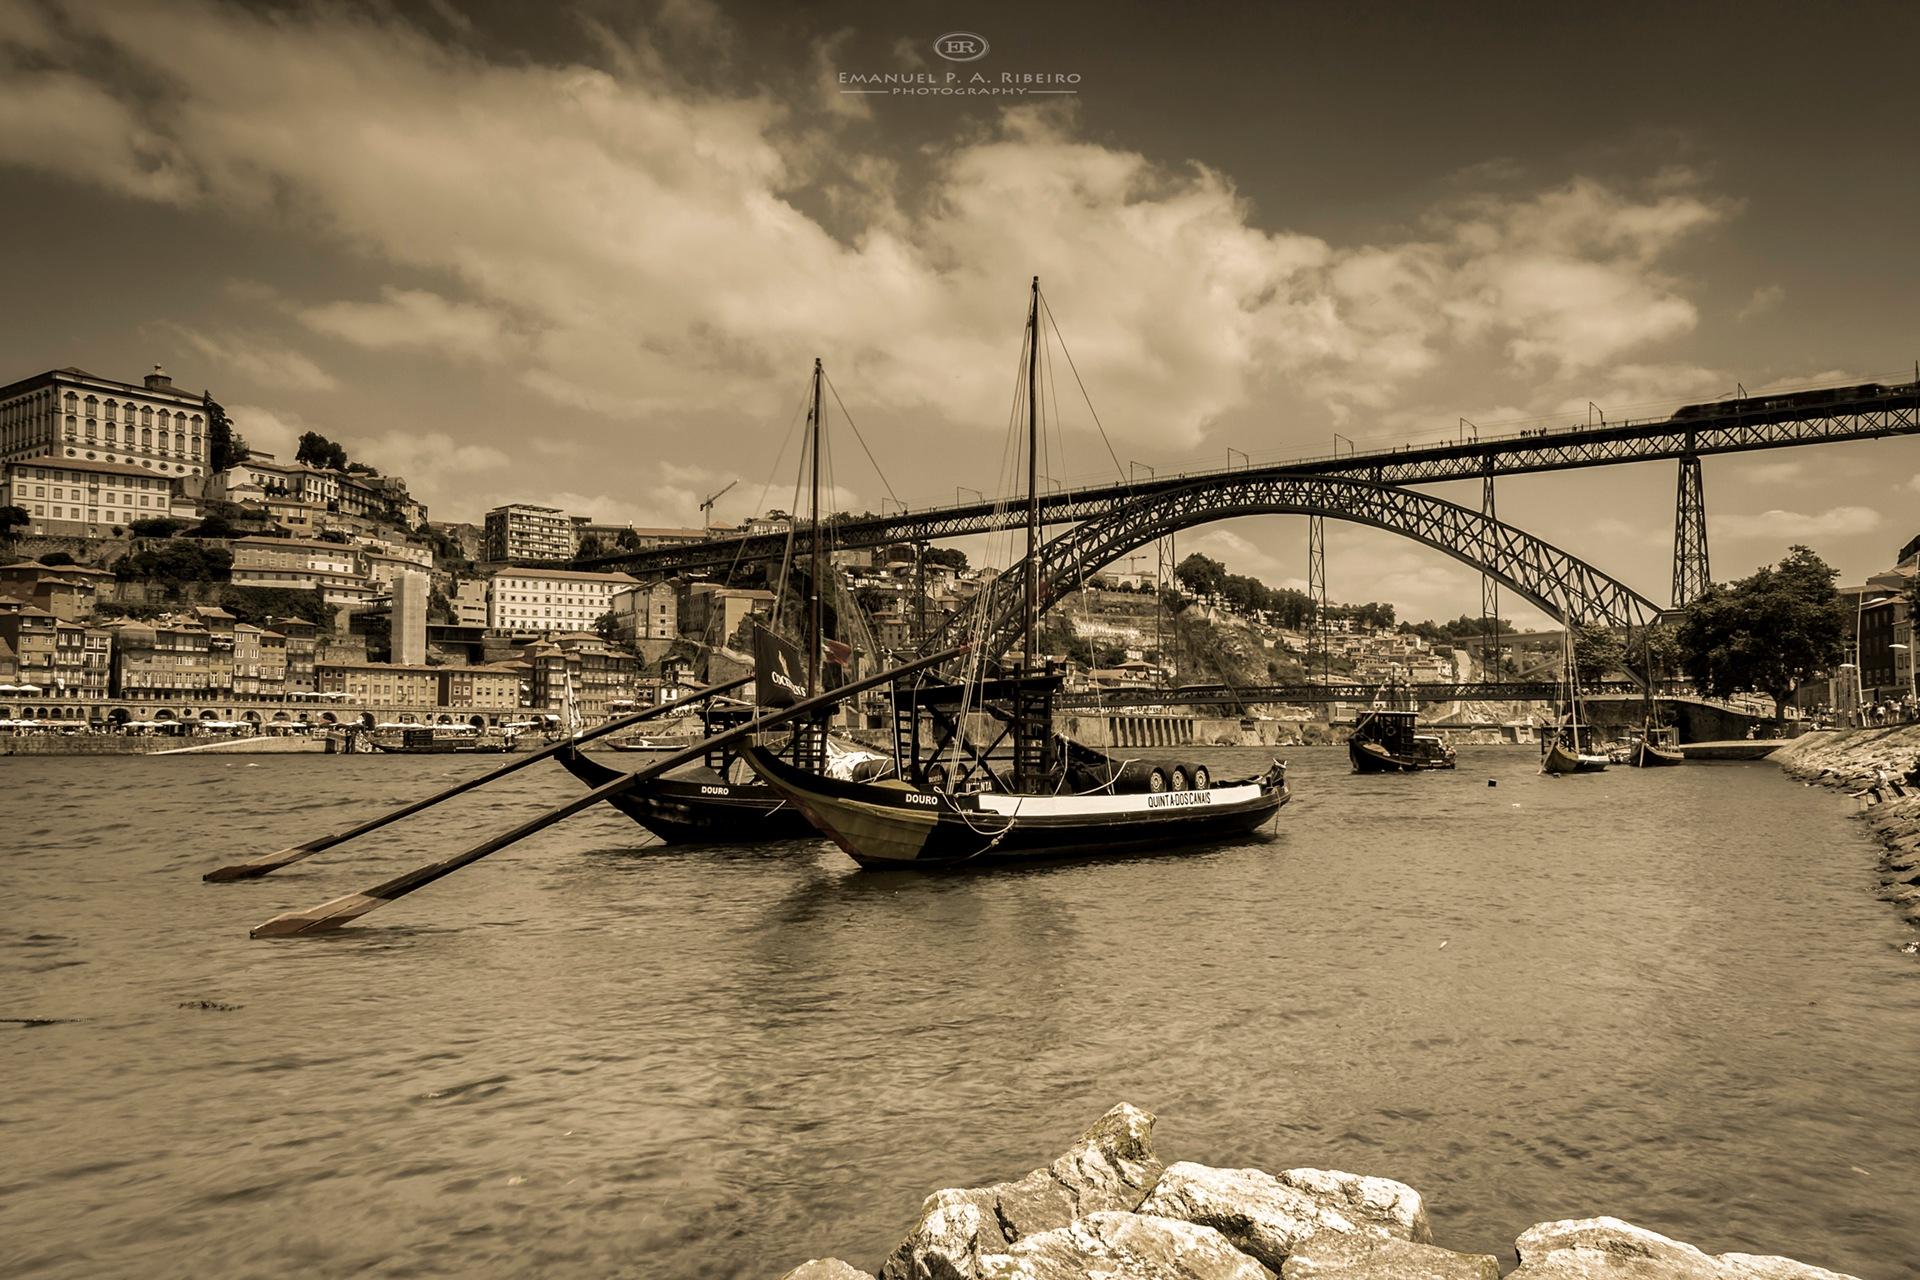 the old Oporto by Emanuel Pereira Aparicio Ribeiro